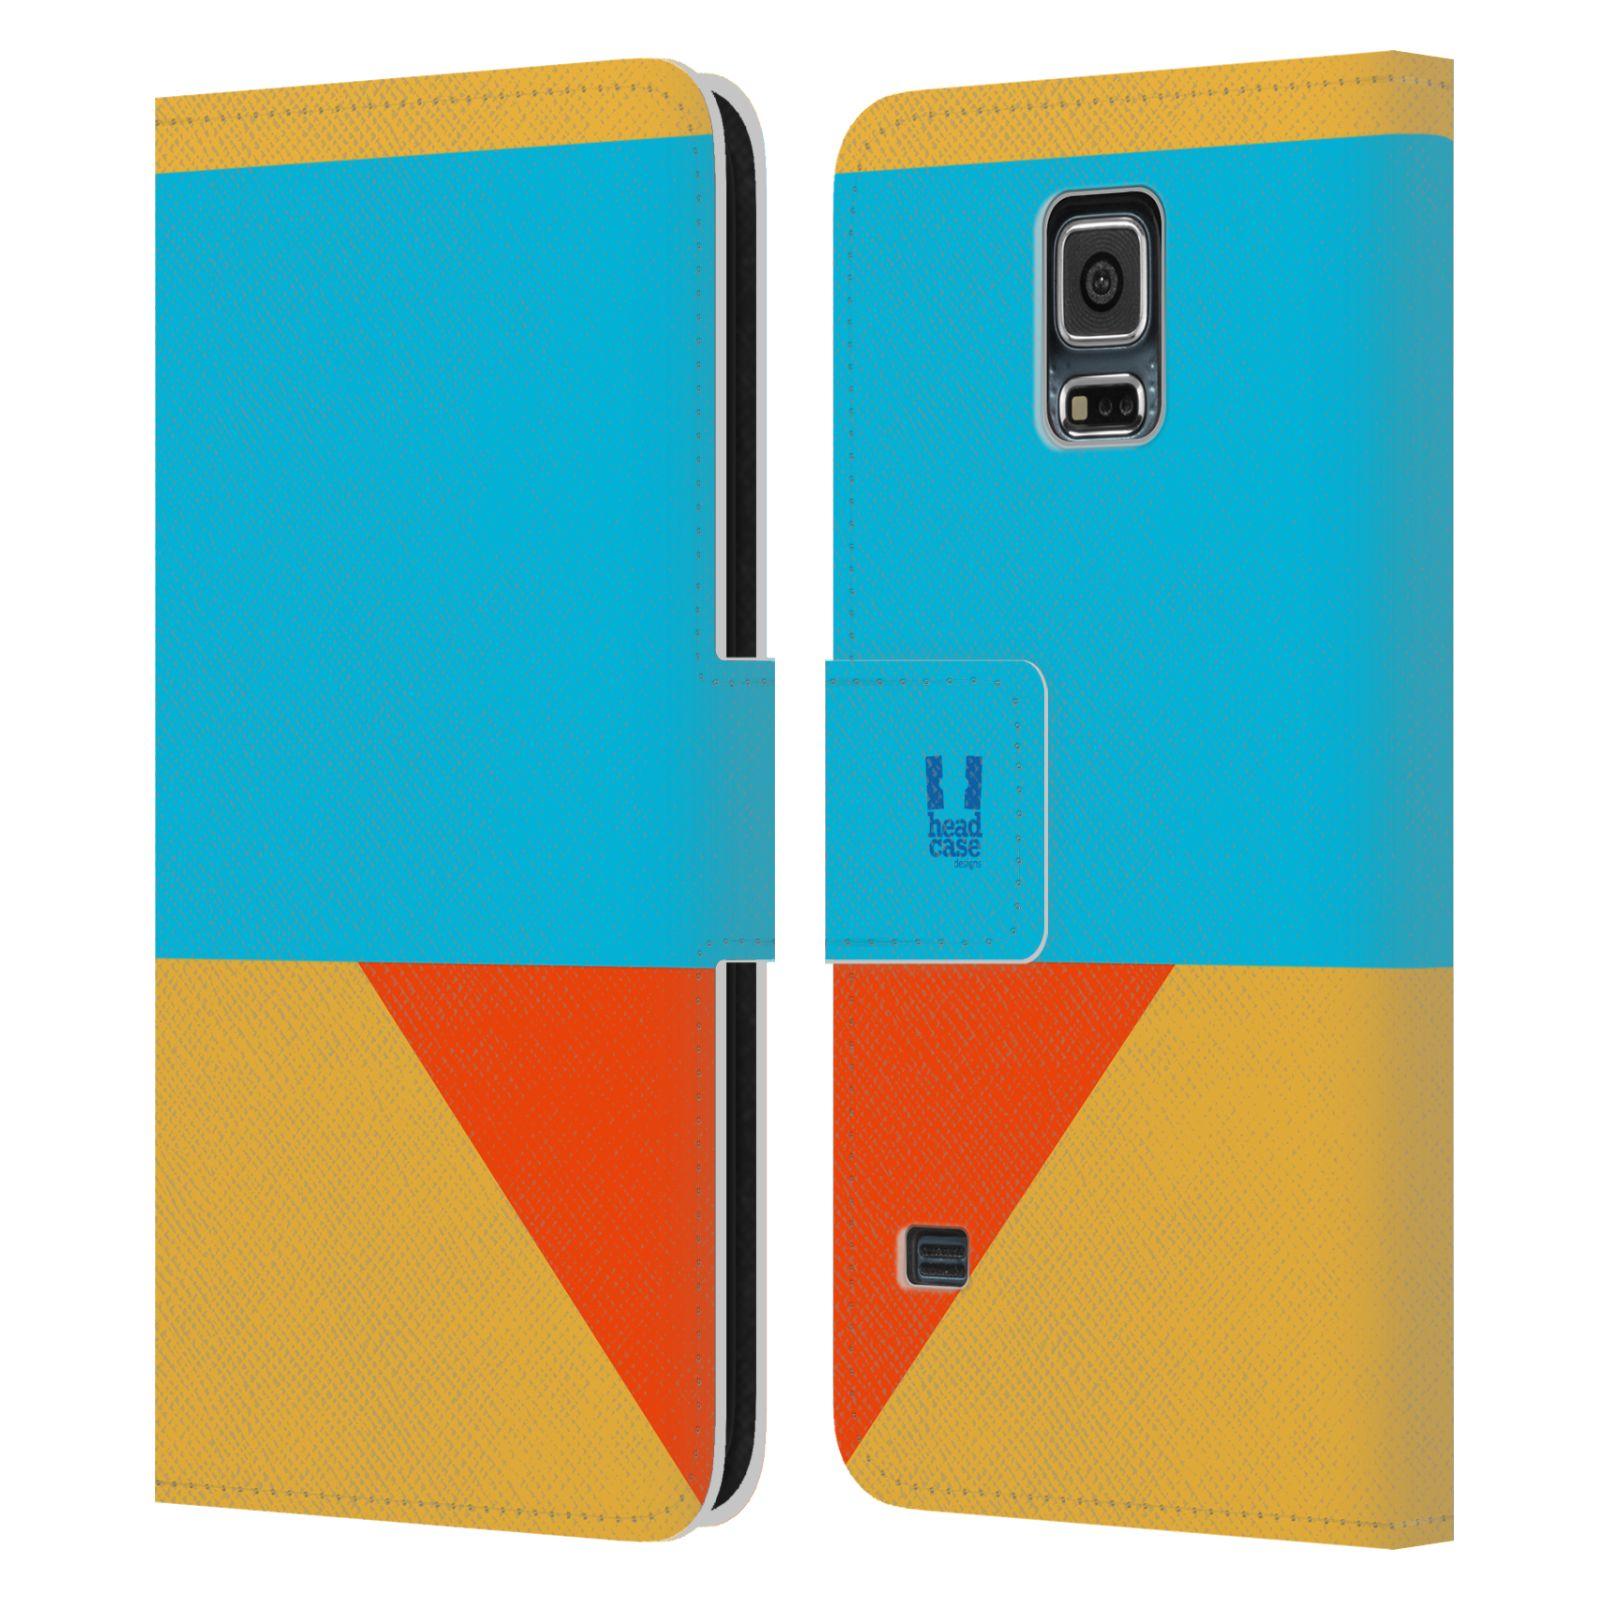 HEAD CASE Flipové pouzdro pro mobil Samsung Galaxy S5 barevné tvary béžová a modrá DAY WEAR